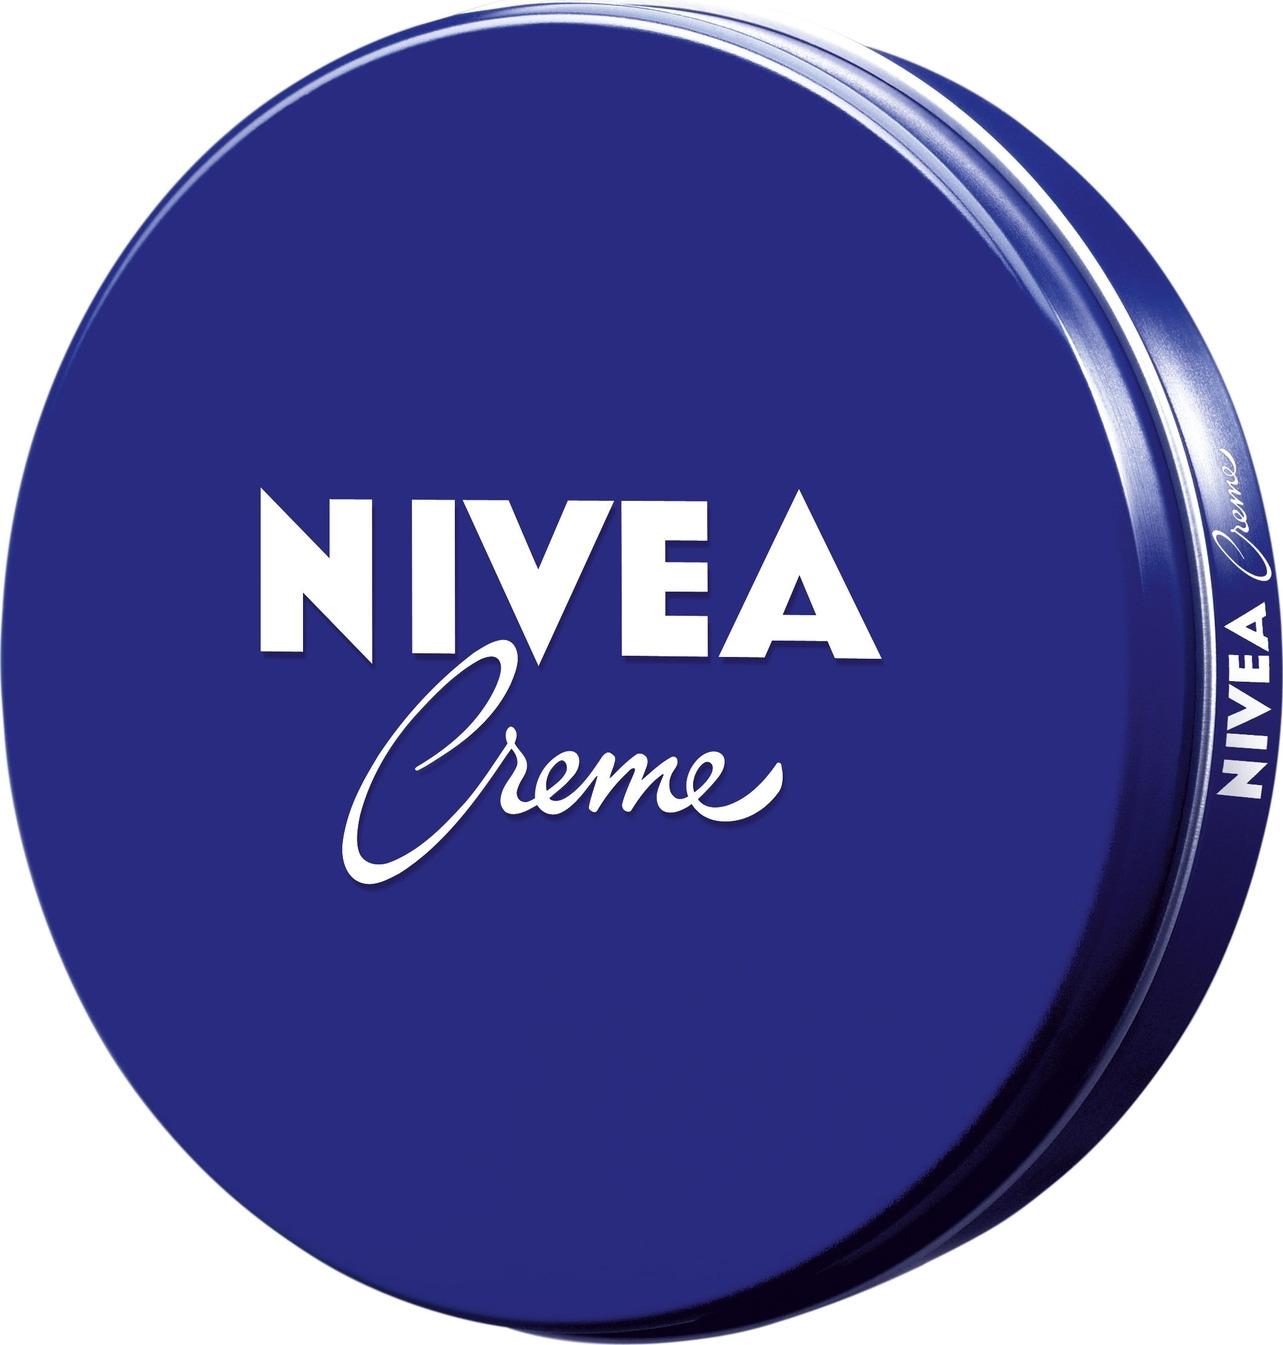 Крем для ухода за кожей Nivea Creme, 150 мл